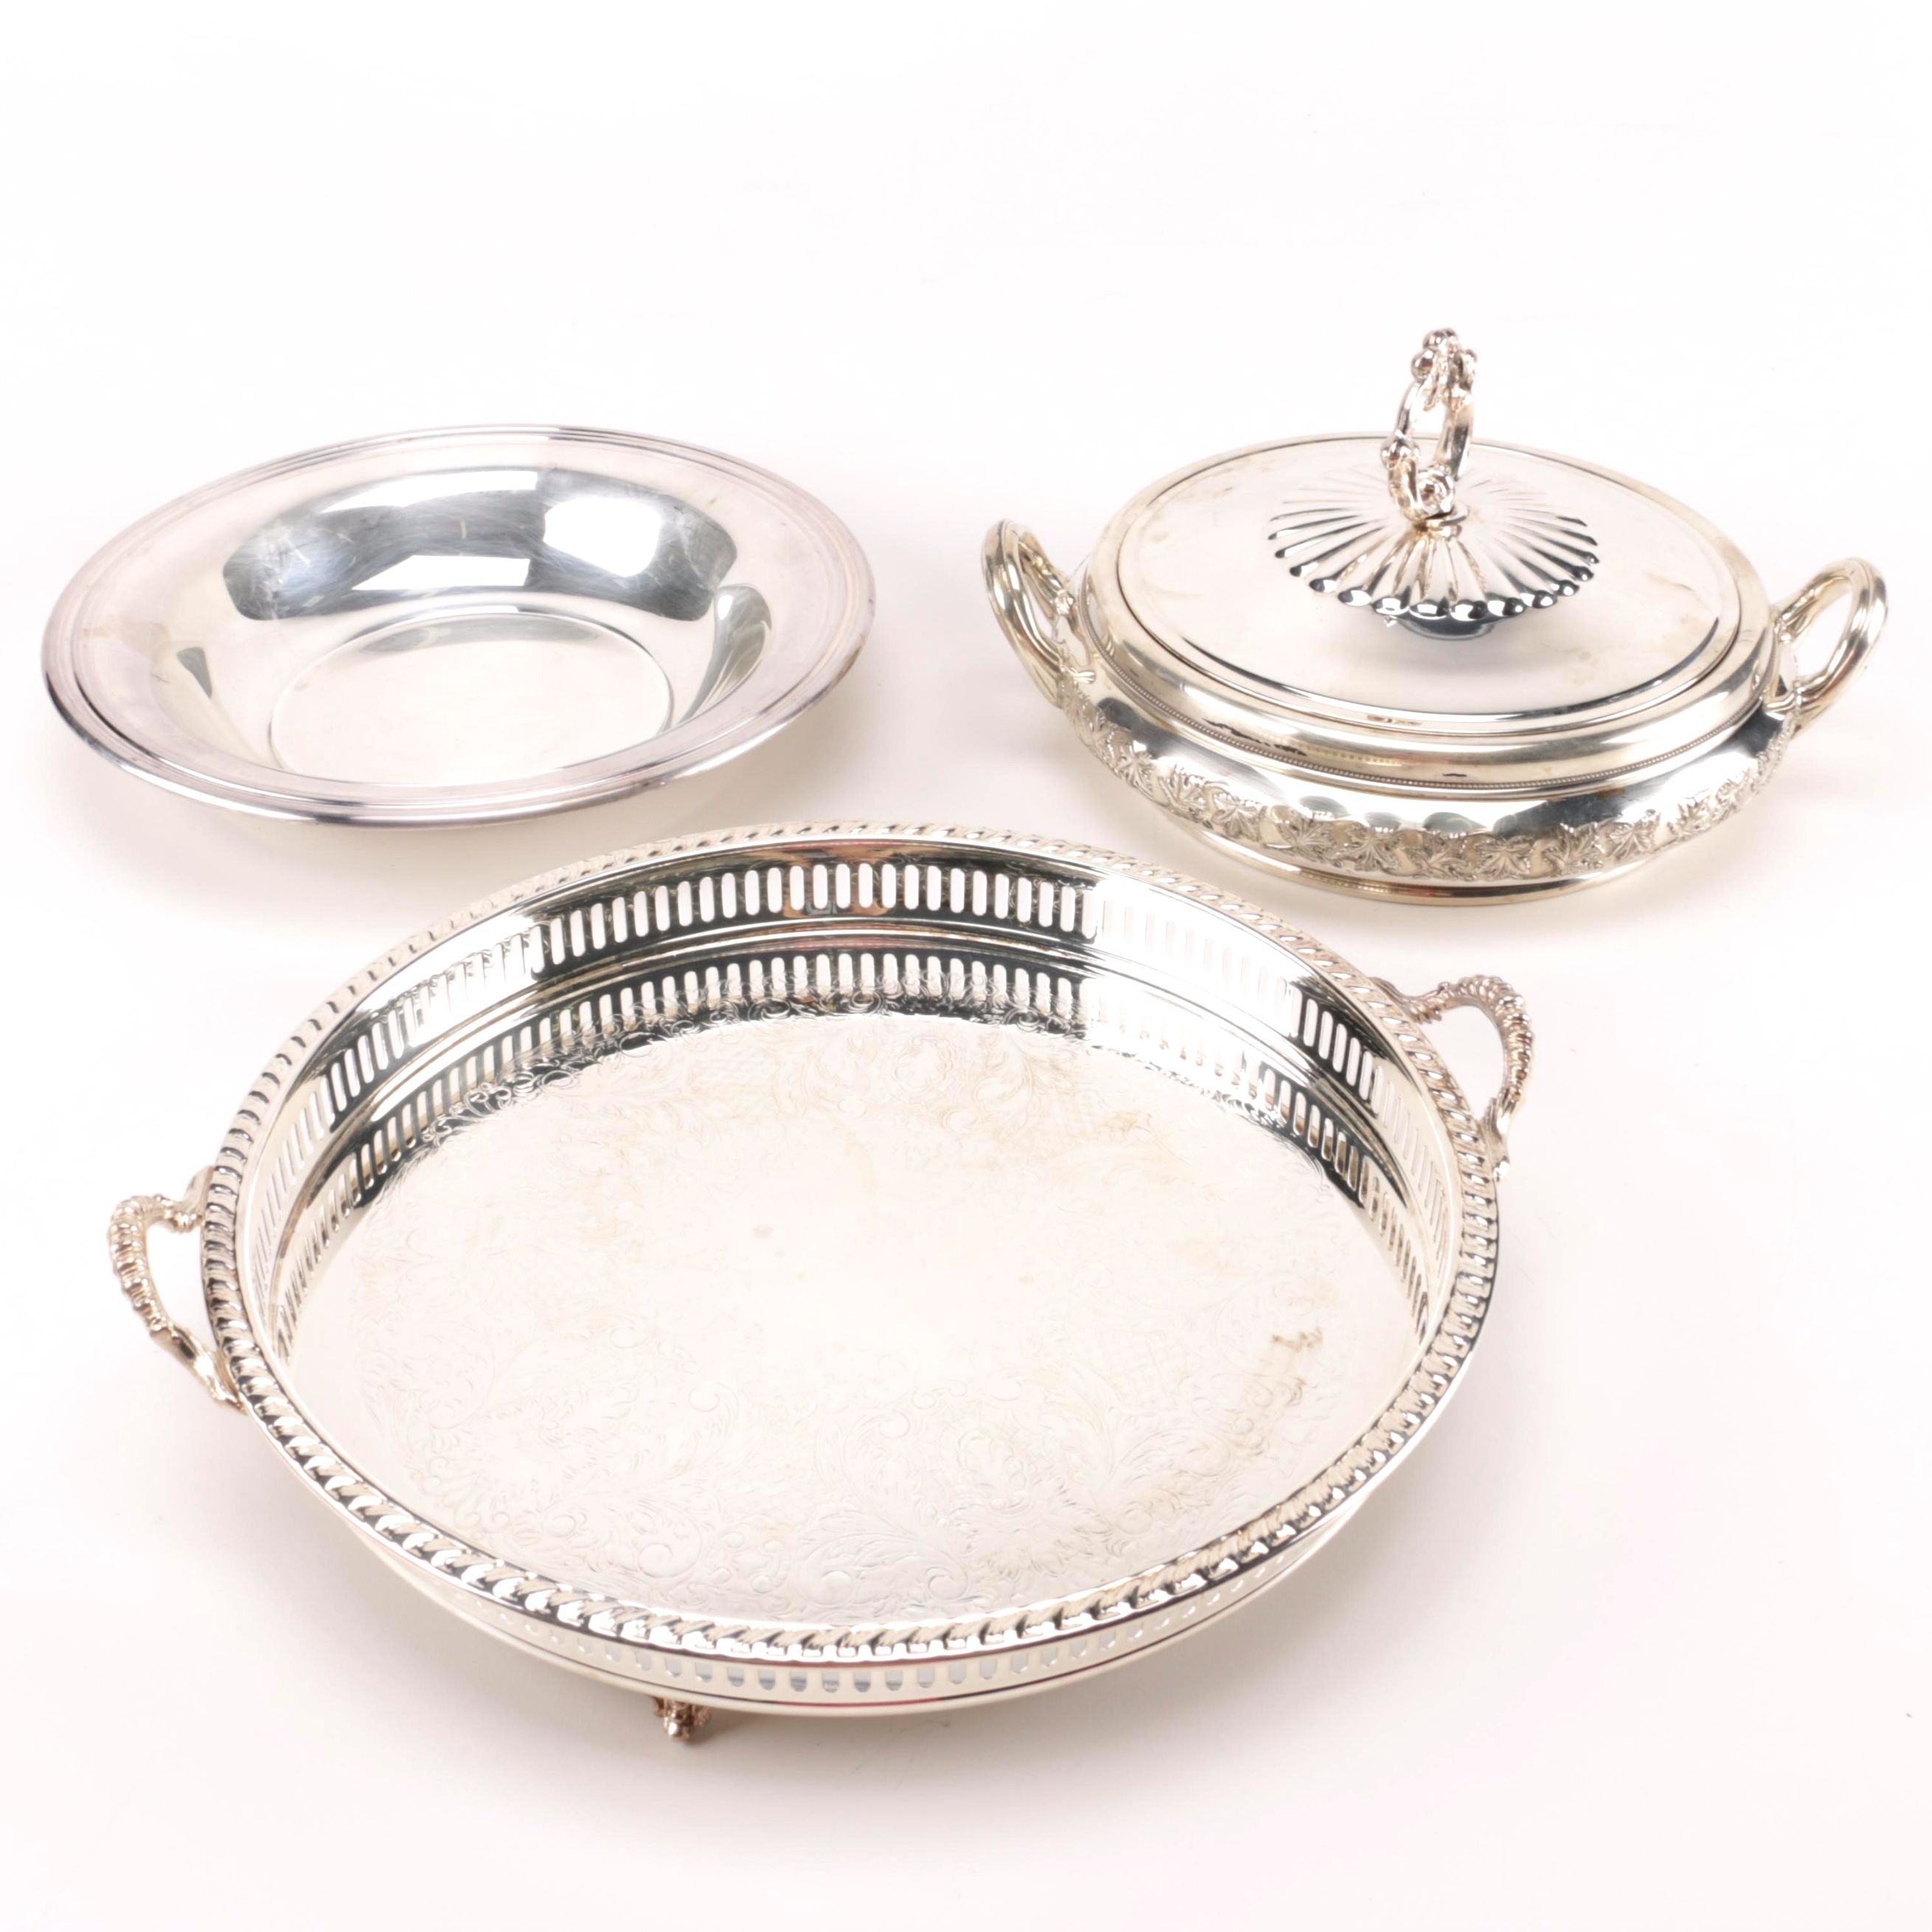 Silver Plate Servingware Featuring W. & S. Blackington